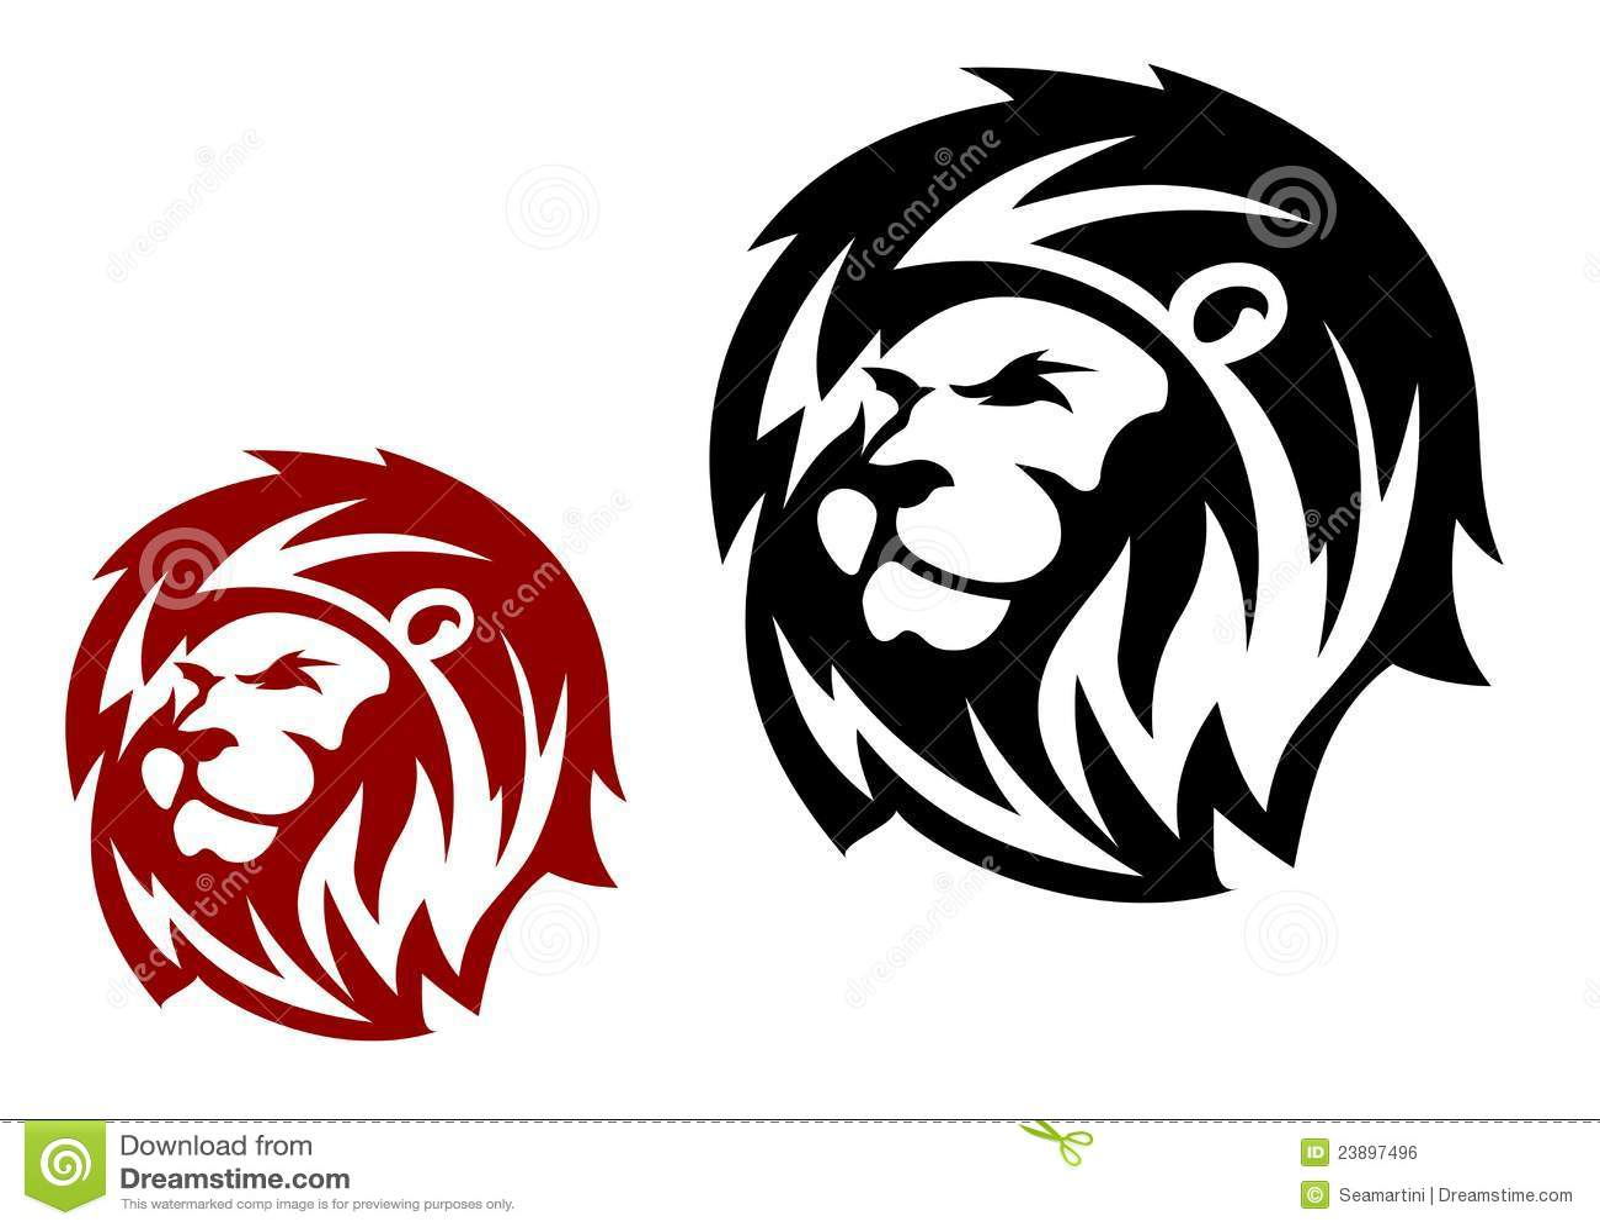 The Lion Star Blog by Jaime Abeytia